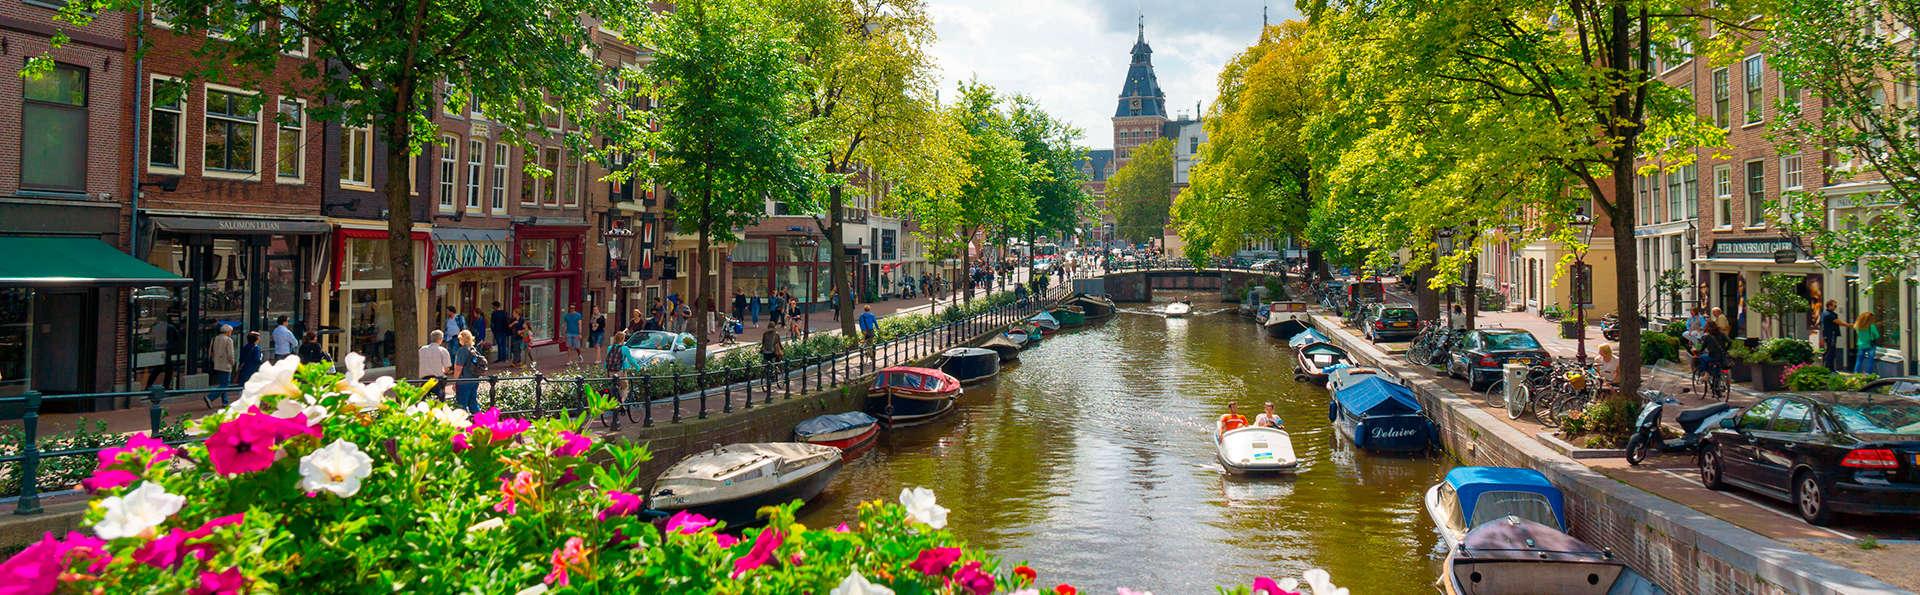 Bastion Hotel Schiphol Hoofddorp - EDIT_amsterdam5.jpg